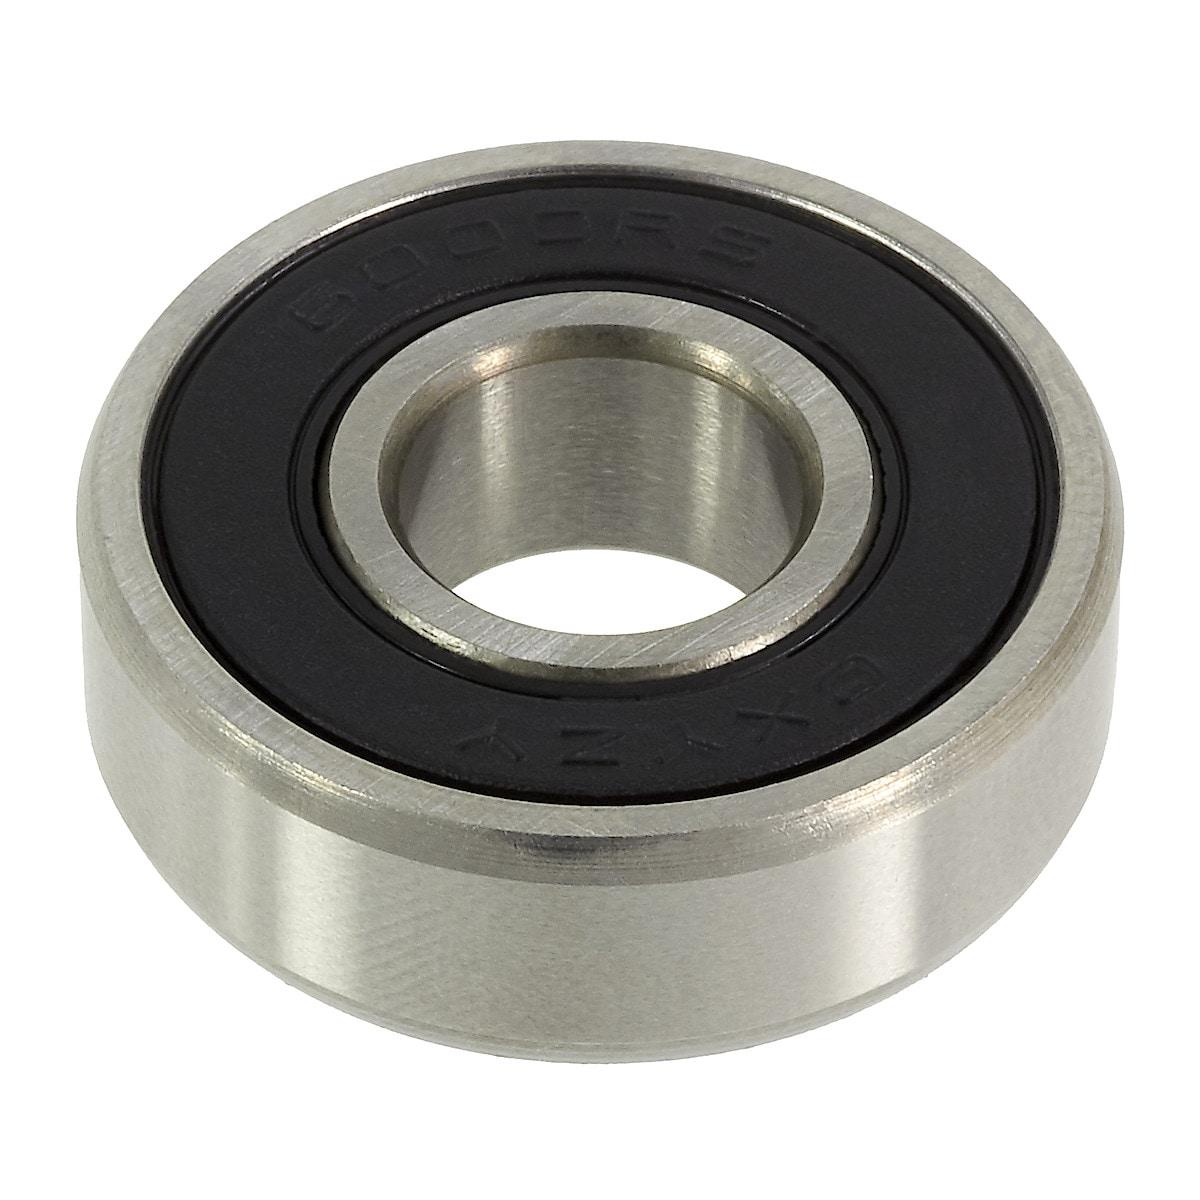 Ball bearing 6000-2RS